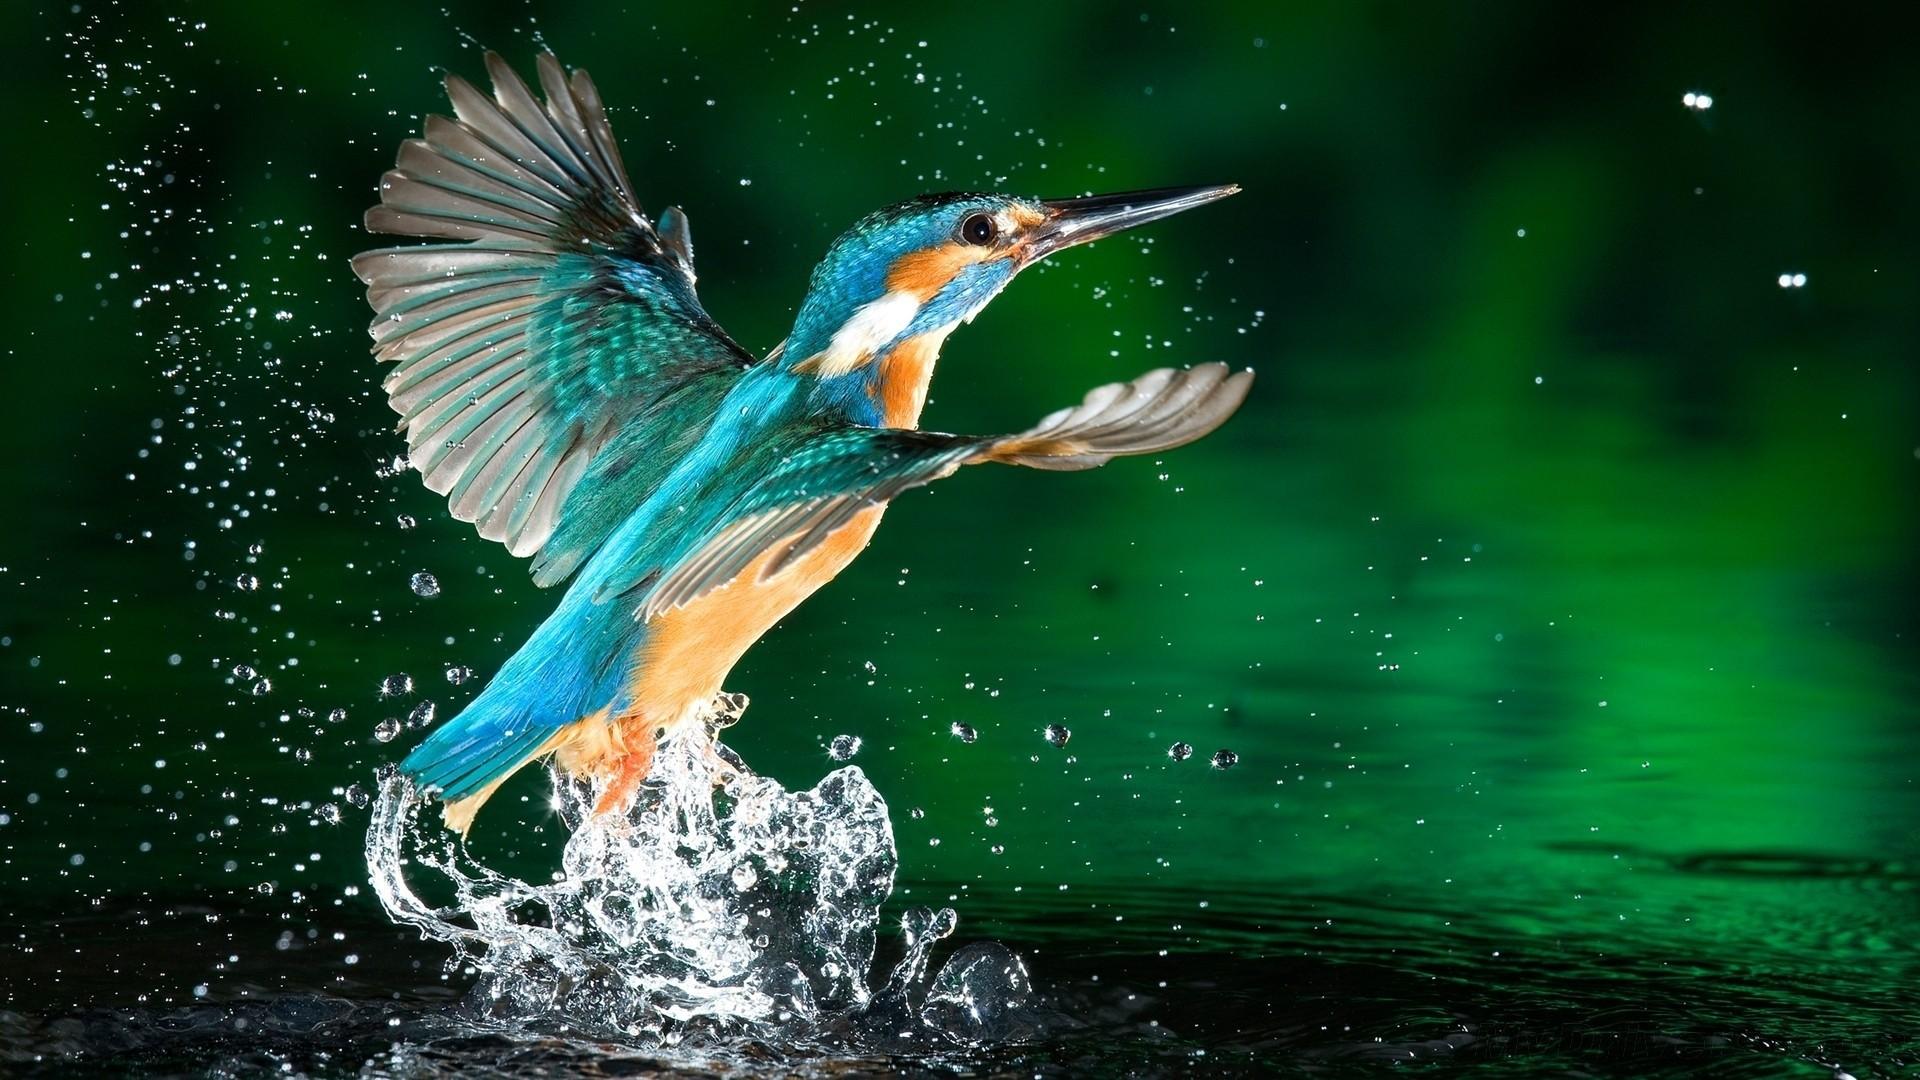 Kingfisher Image